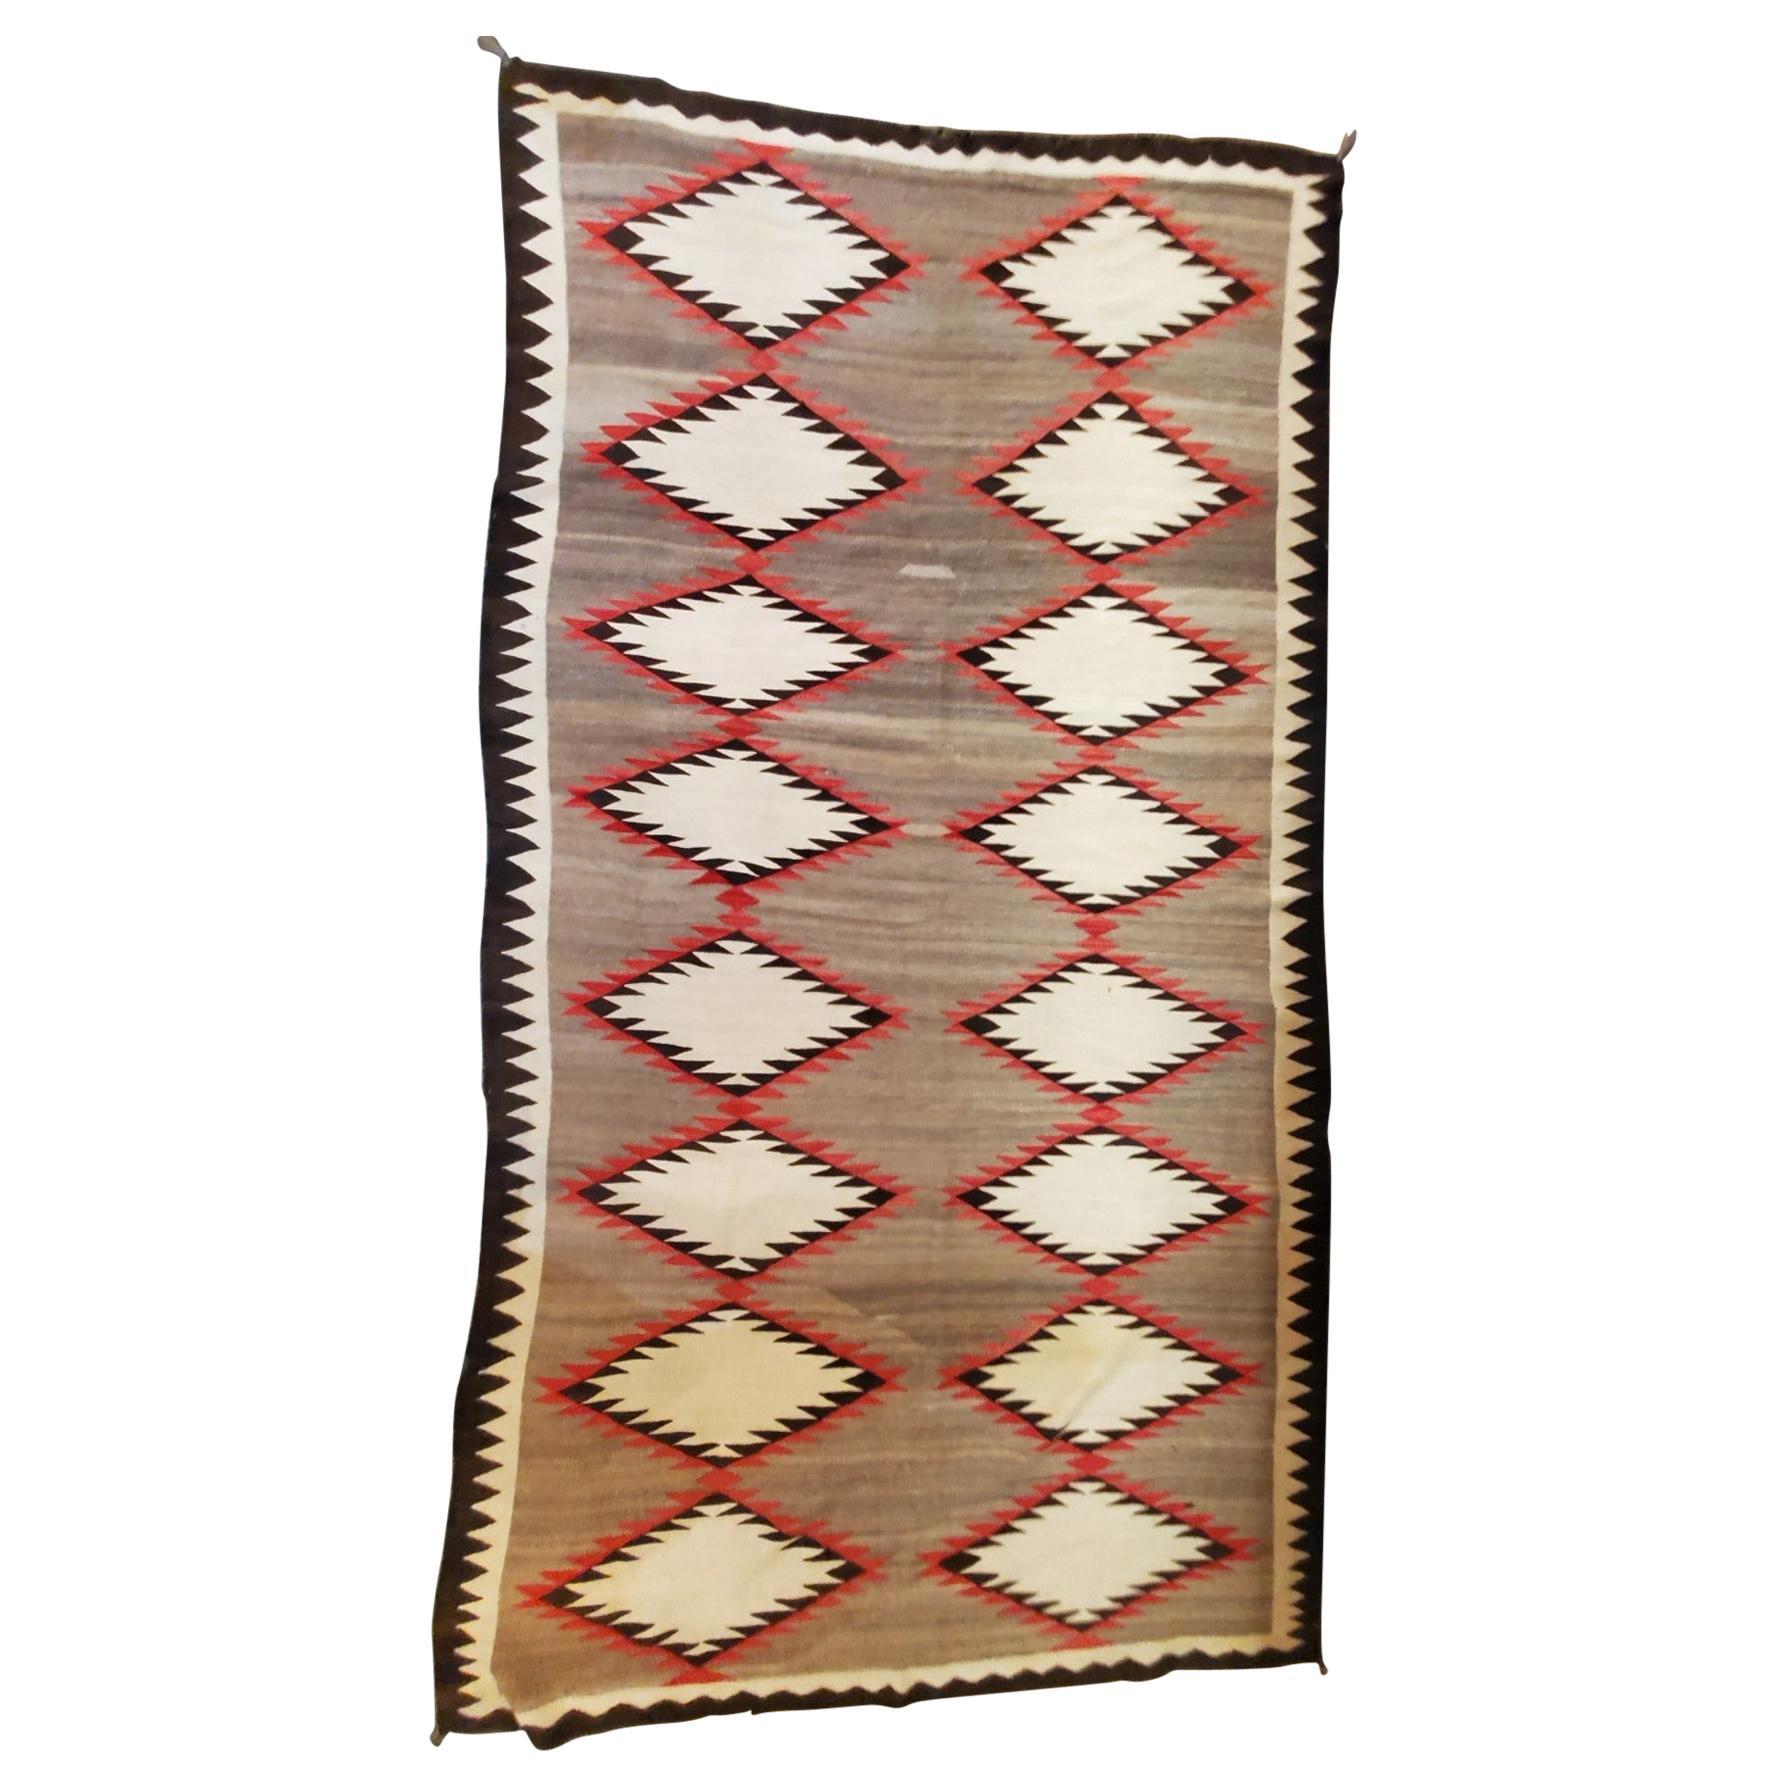 Navajo Indian Weaving Runner or Room Size Rug, Monumental